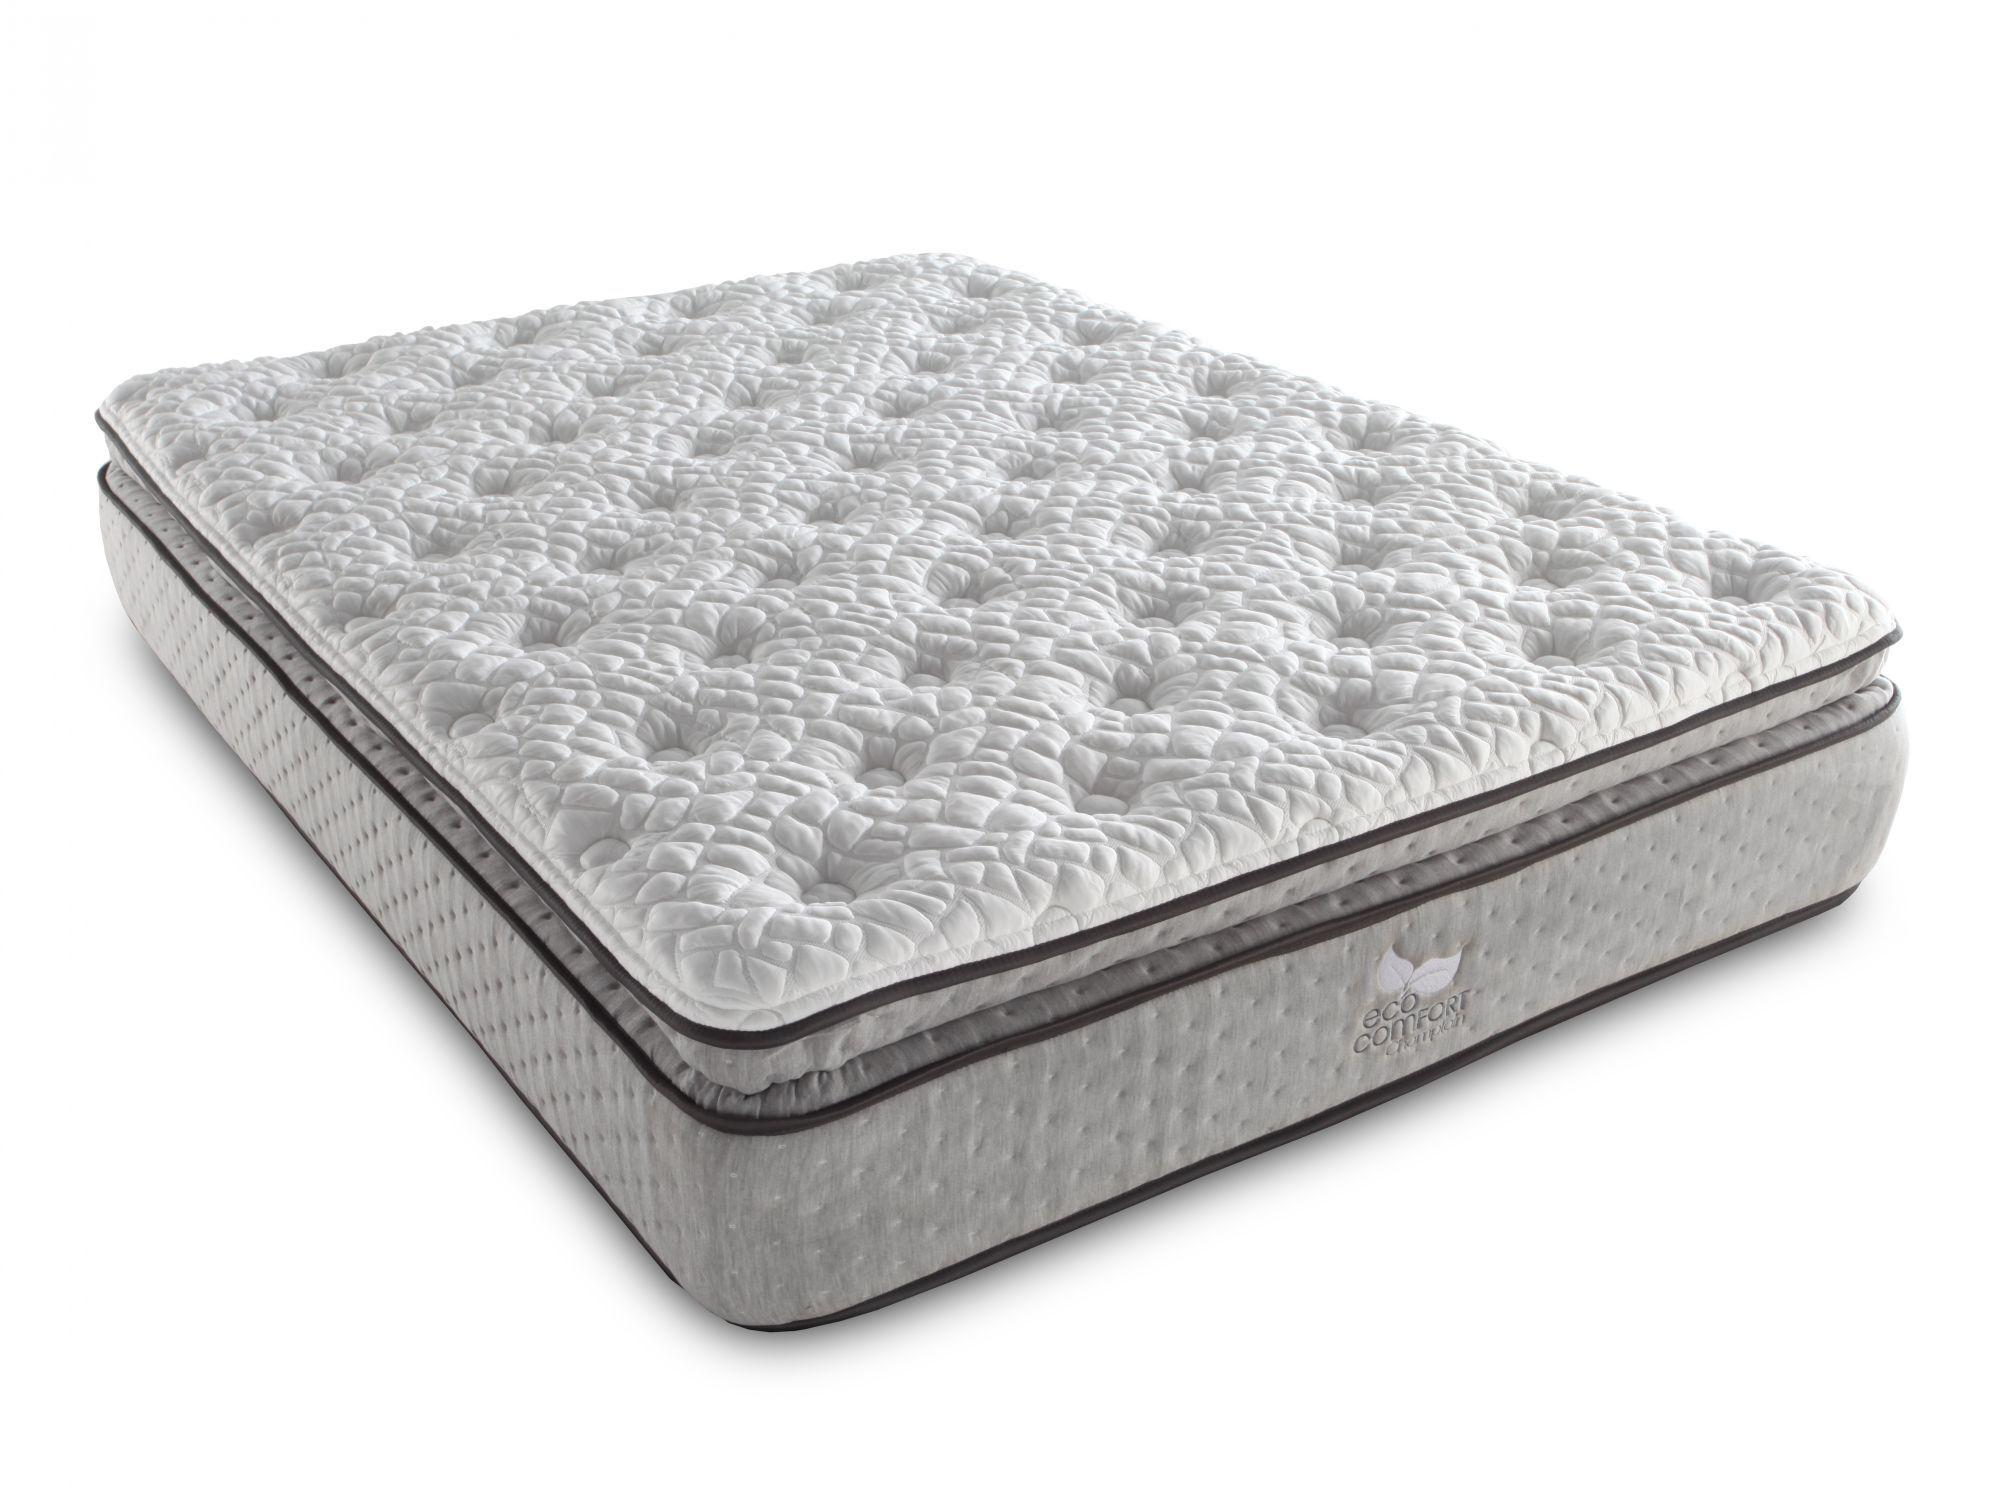 ecocomfort champlain king mattress